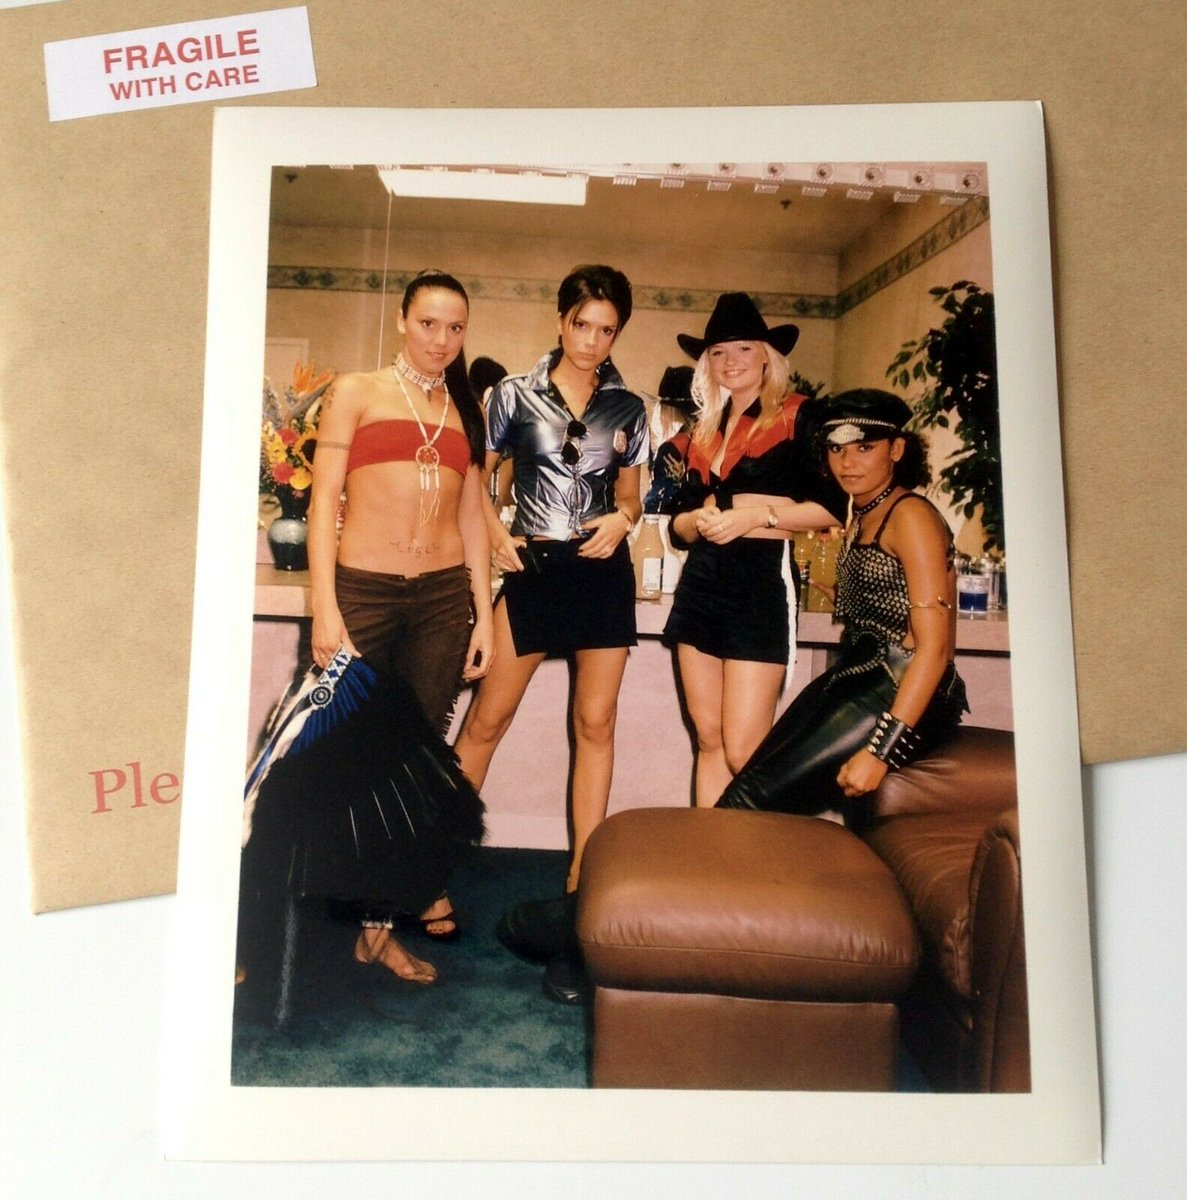 #MelB of #TheSpiceGirls backstage during the #SpiceWorld tour.   Promo(tion) Prints @   eBay https://t.co/mfBsbPm2It   Etsy https://t.co/5Z1V94TxBt  #ScarySpice #PoshSpice #SpiceGirls #EmmaBunton #VictoriaBeckham   #MelanieChisholm New album/tour info https://t.co/M7aeb6gSD7 https://t.co/3TExFA8tKb